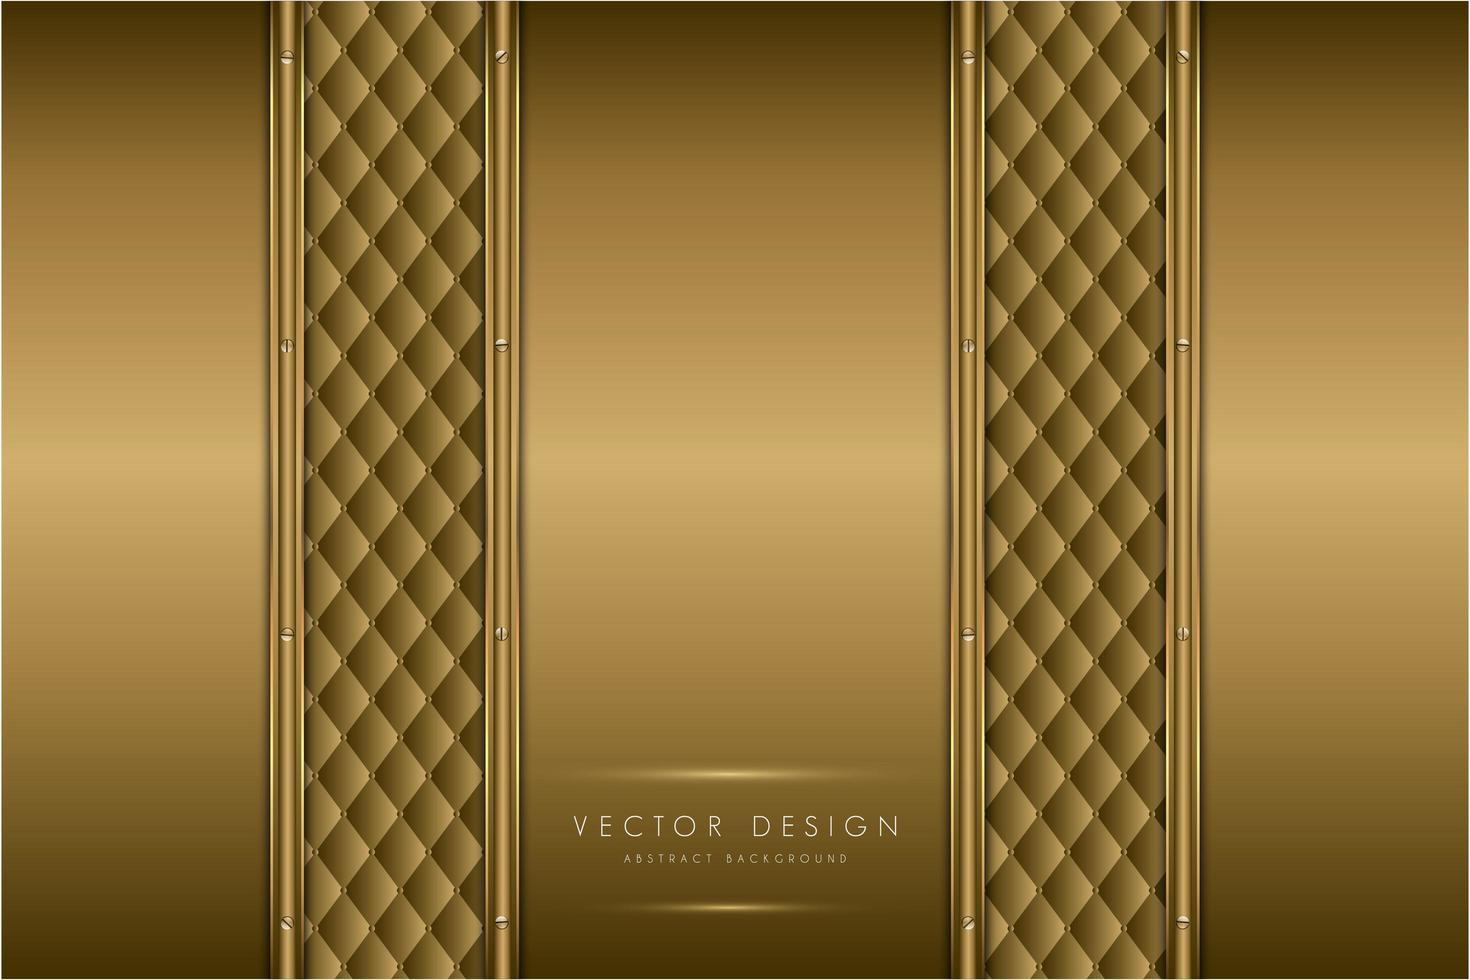 elegantes paneles de metal dorado con textura de tapicería vector